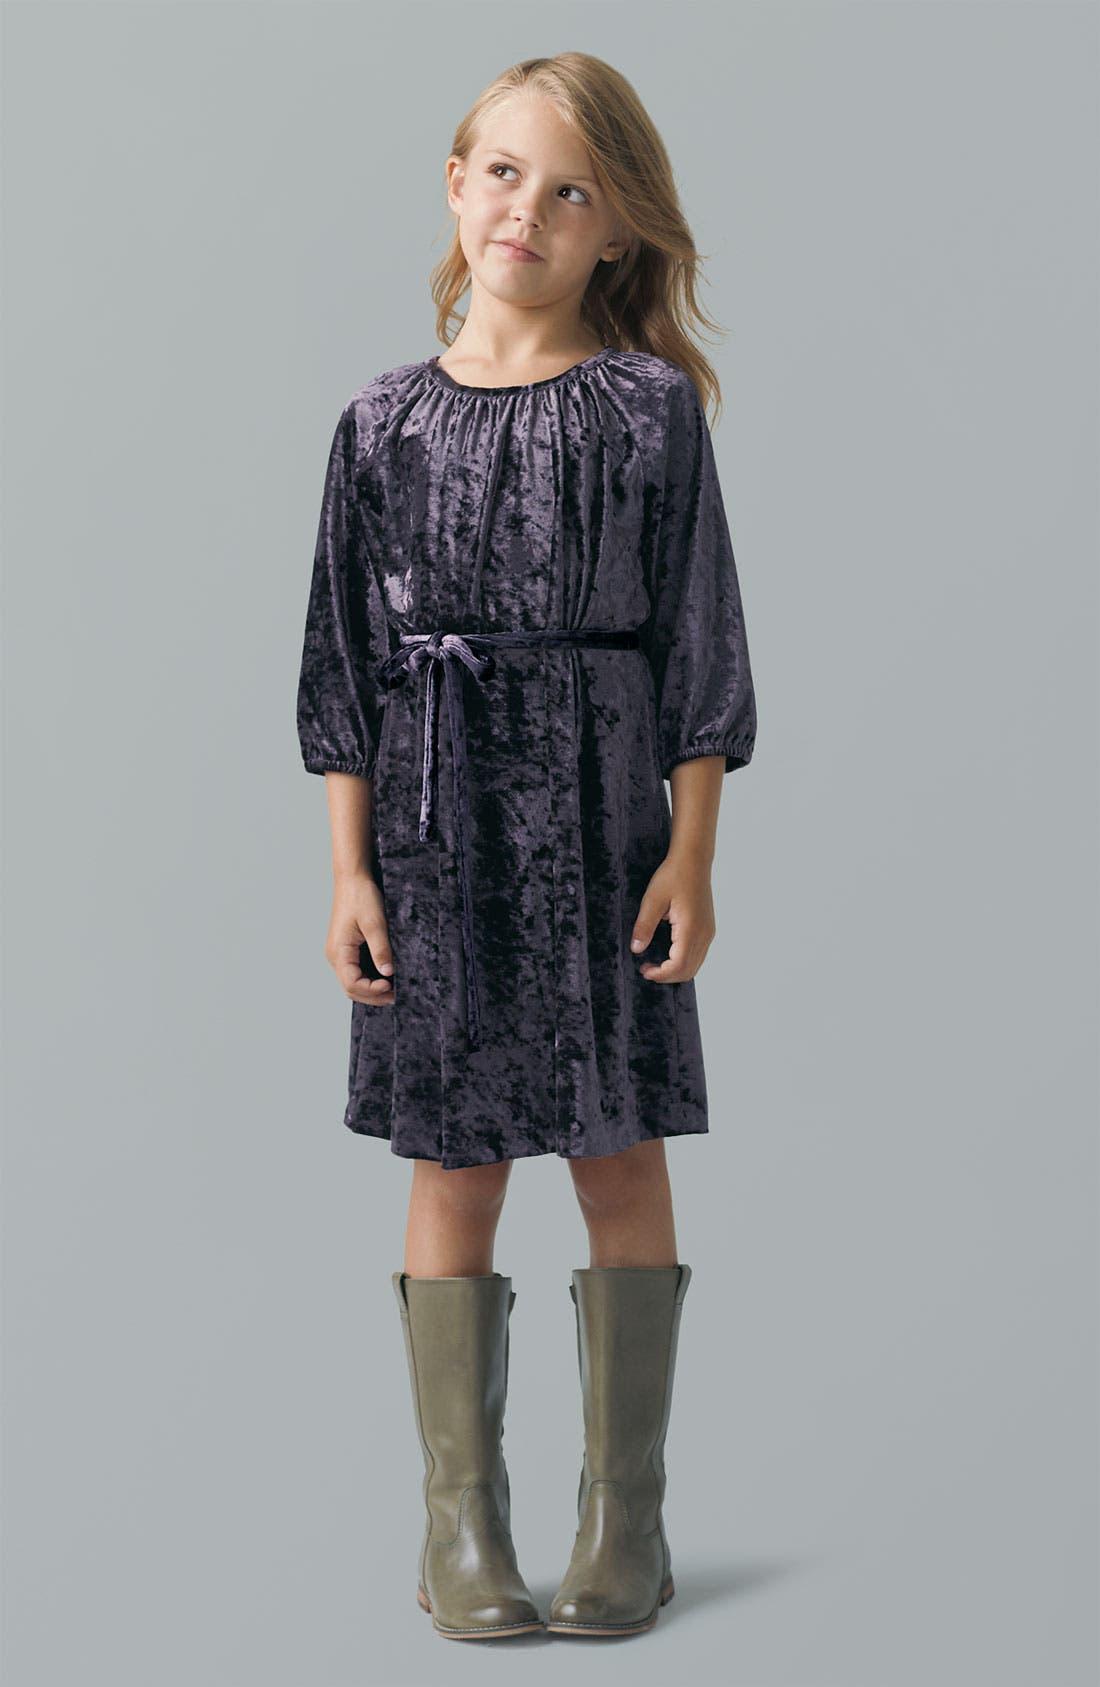 Alternate Image 1 Selected - Peek Dress & Riding Boot (Toddler, Little Girls & Big Girls)